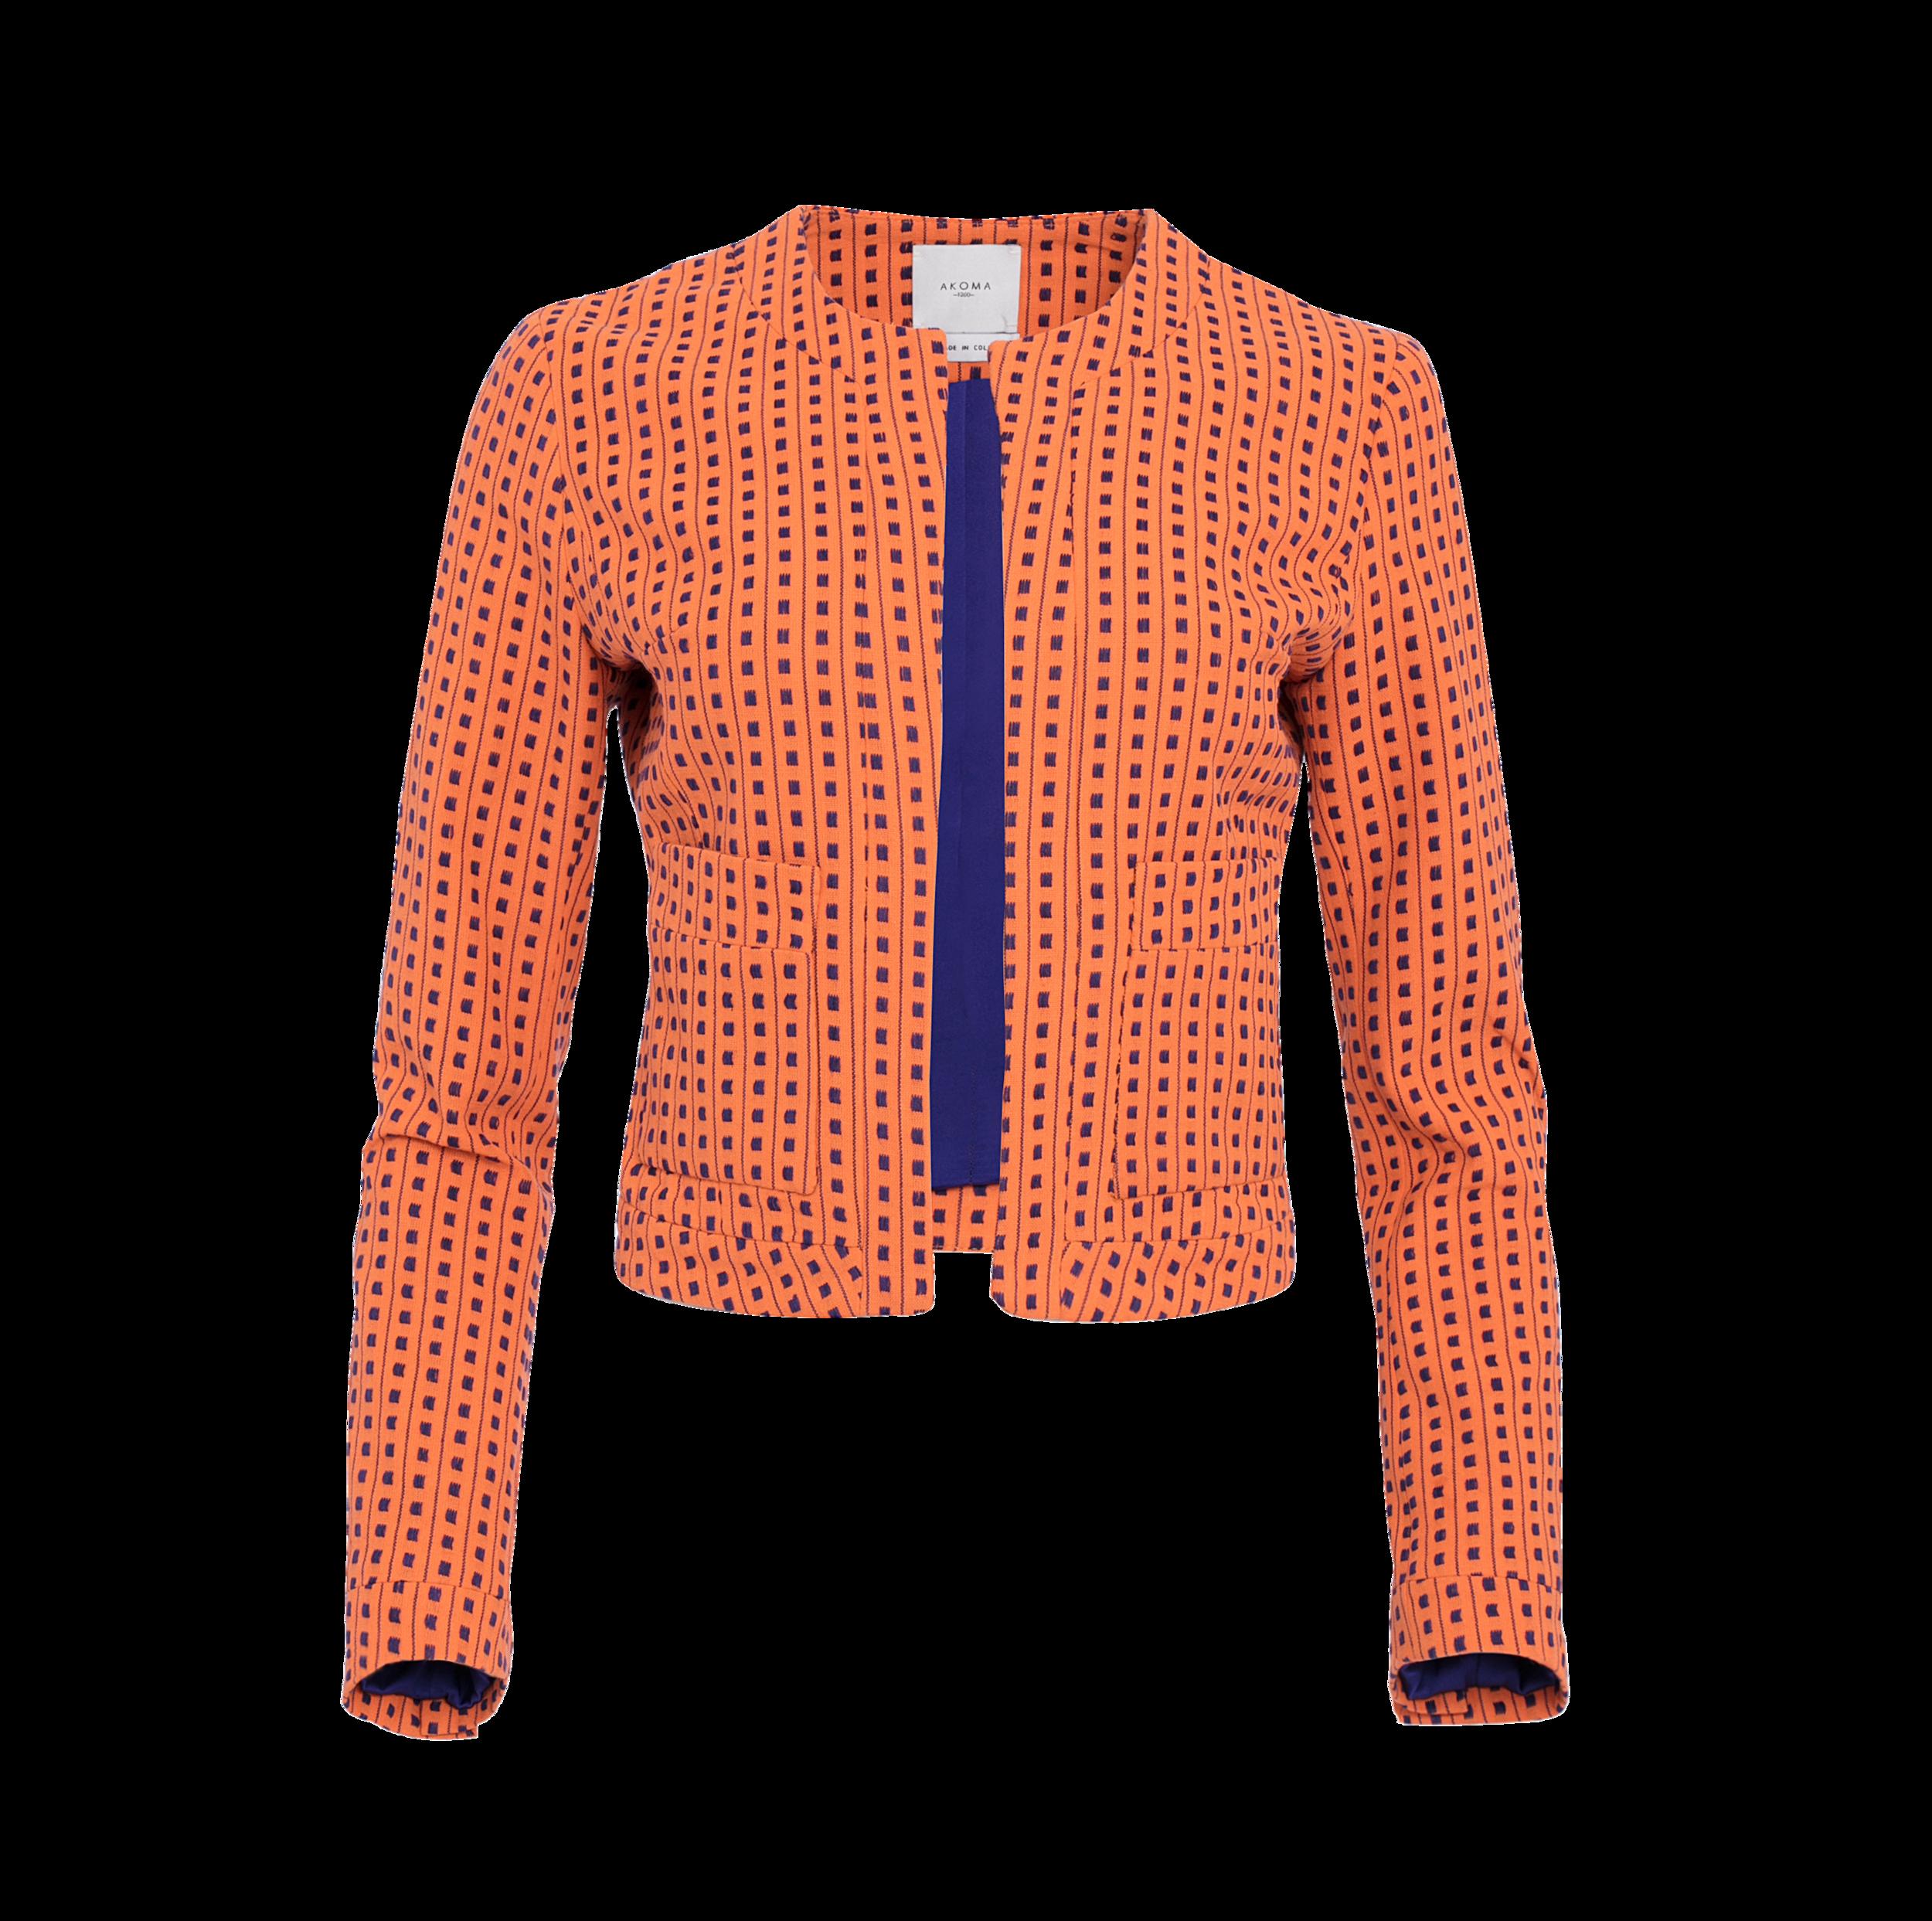 Maïmouna Jacket — Akoma 1260 Jackets, Red leather jacket